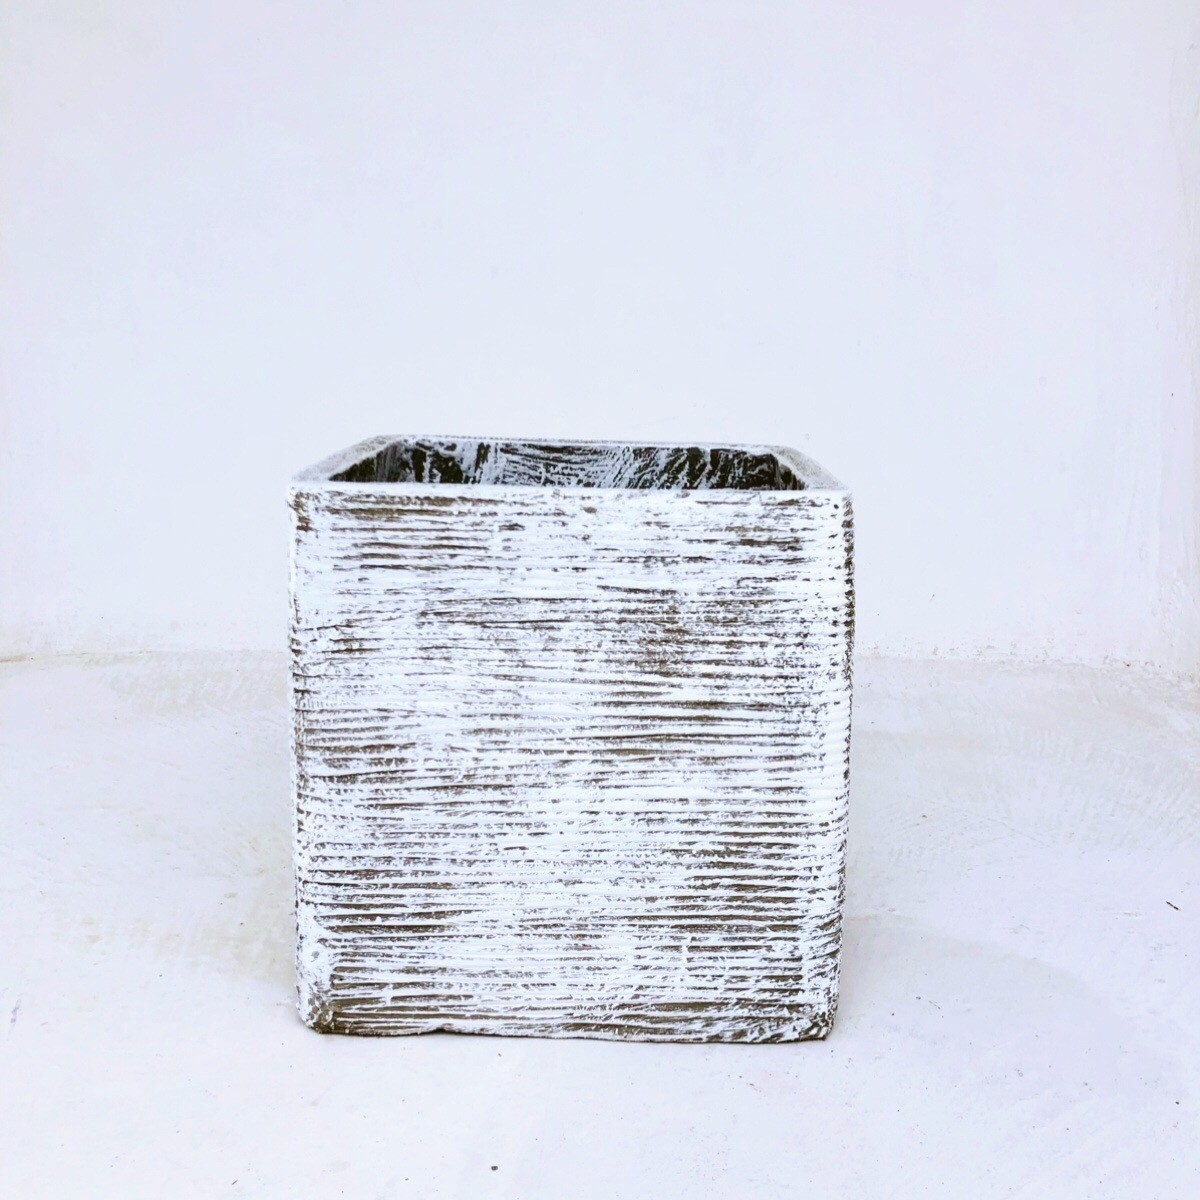 Braided Square Planter Medium Whitewash Finish - H300mm x W300mm - 10kg